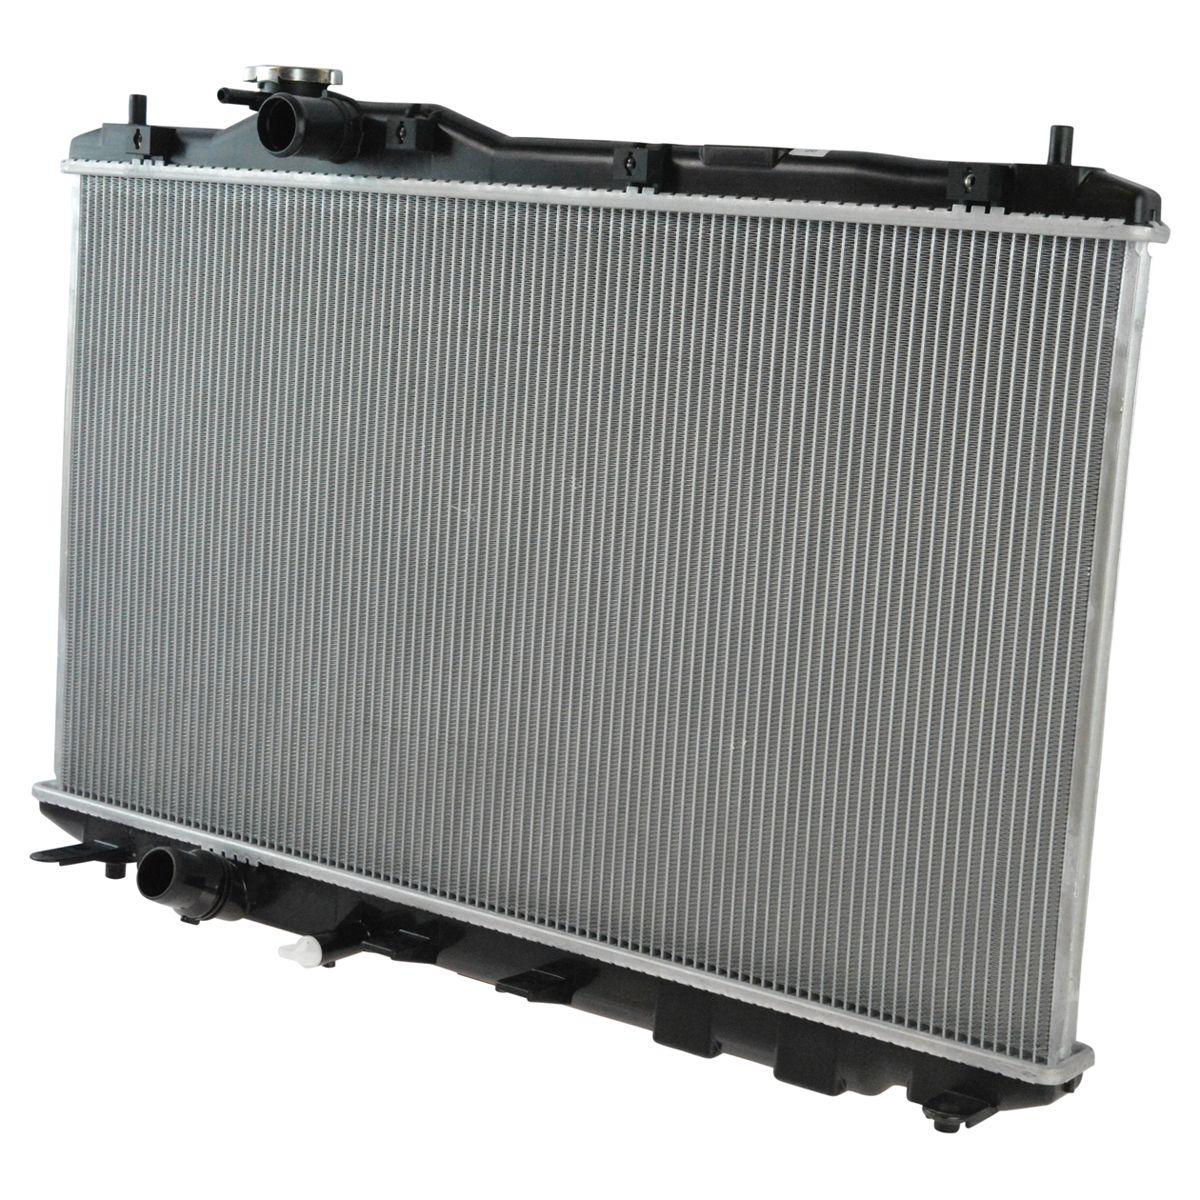 Radiator Assembly Plastic Tank Aluminum Core For Honda